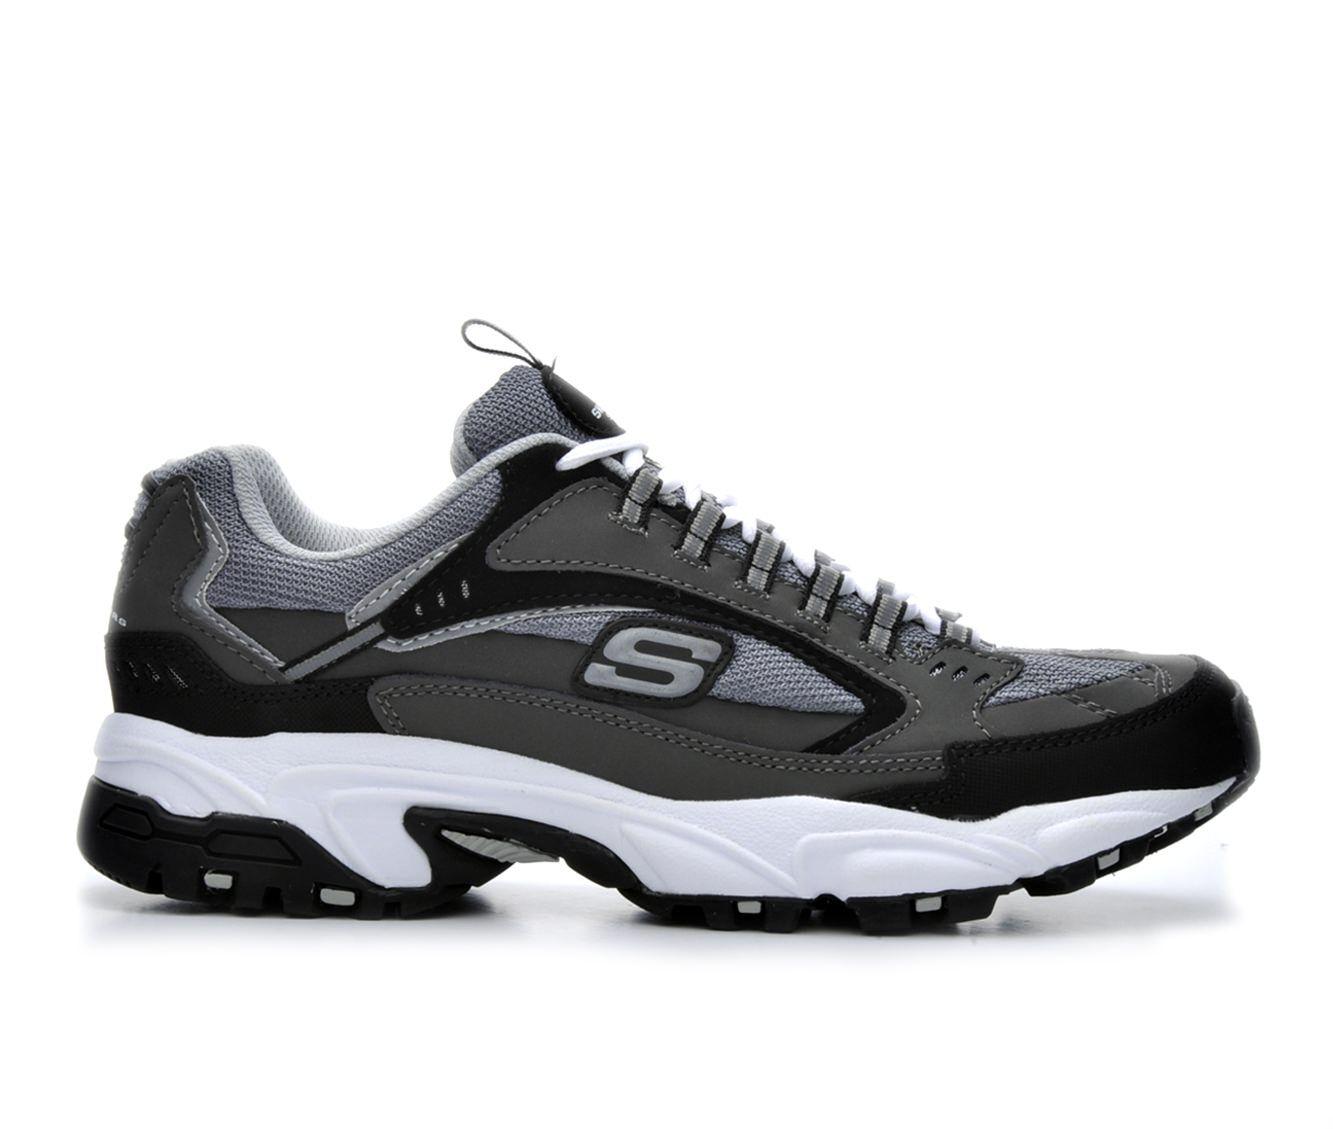 Men's Skechers Cutback 51286 Training Shoes Gry/Blk/Wht